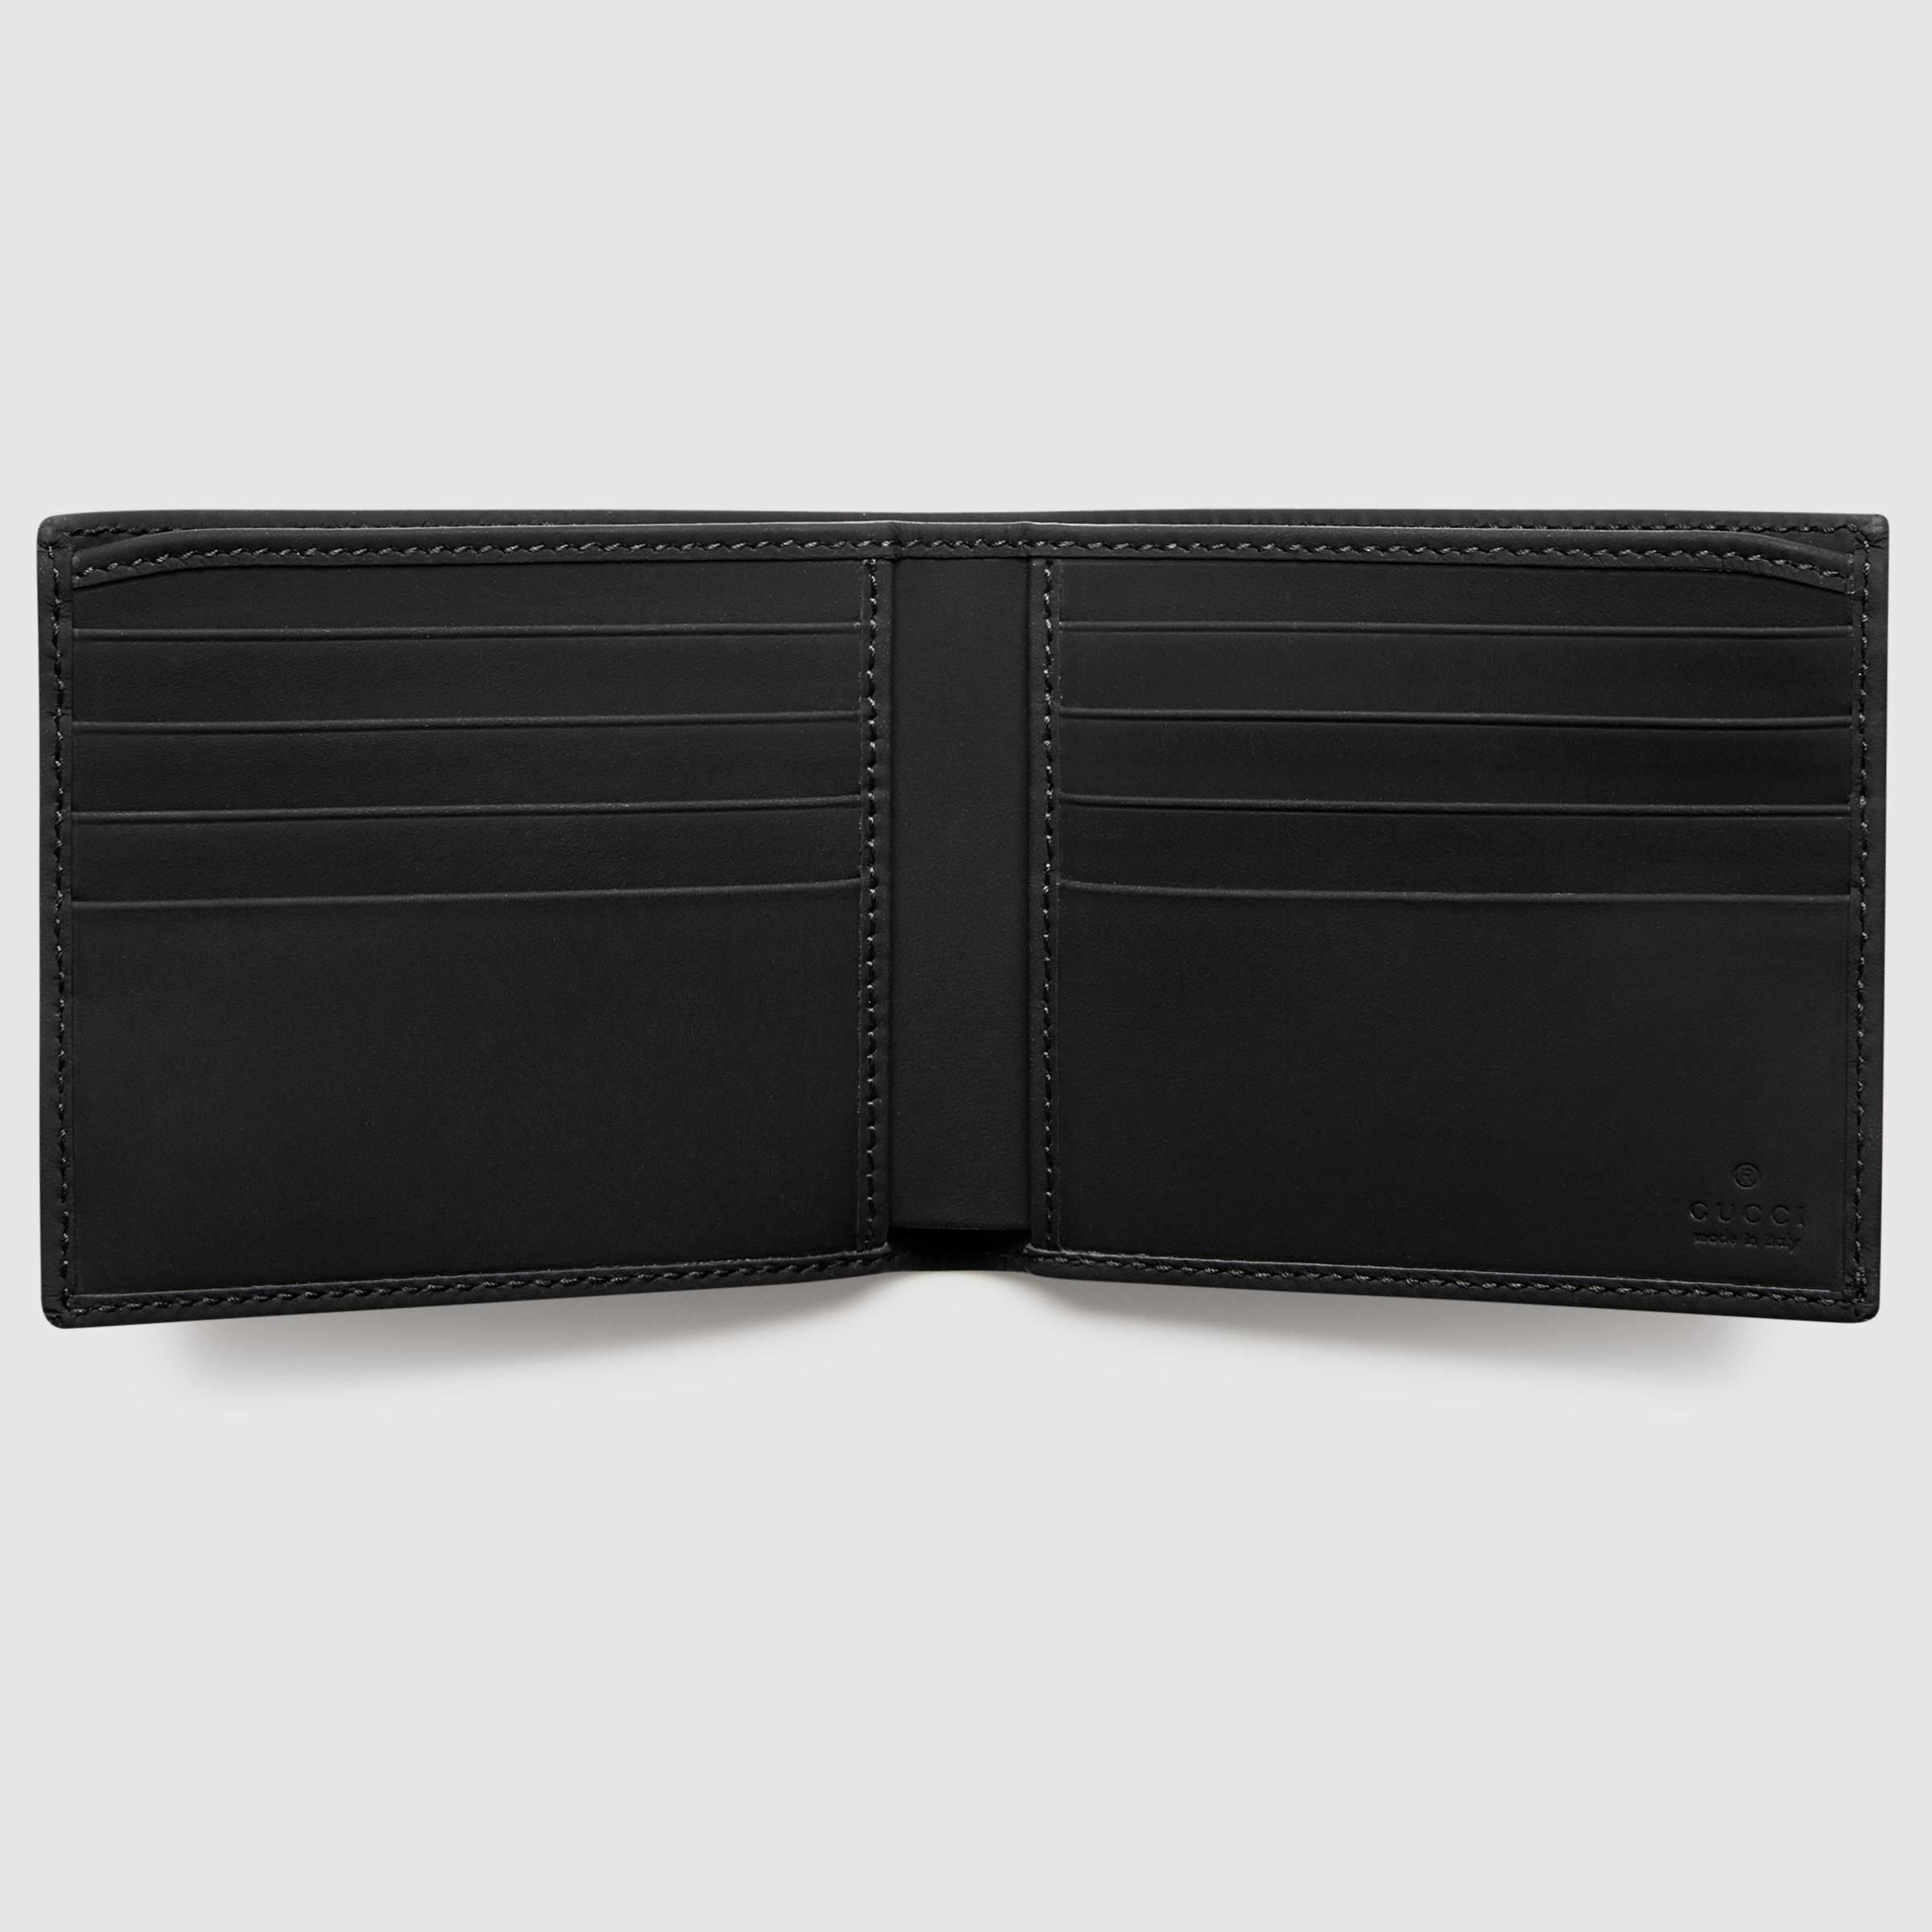 8b1b14d3c75b Lyst Gucci Rubber Ssima Leather Bi Fold Wallet In Black For Men